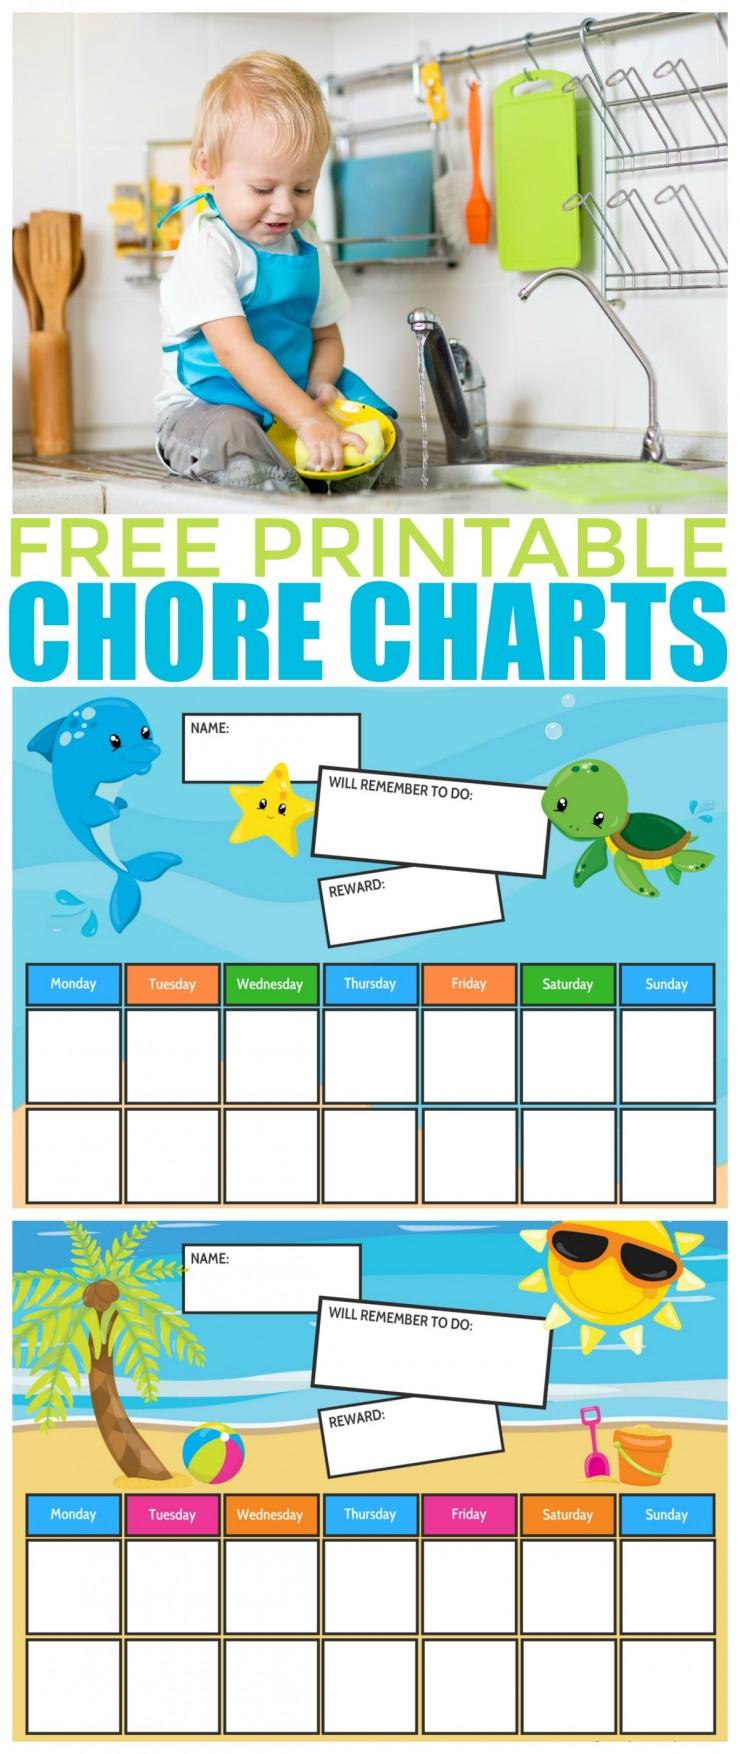 Ocean Amp Beach Themed Free Printable Chore Charts Frugal